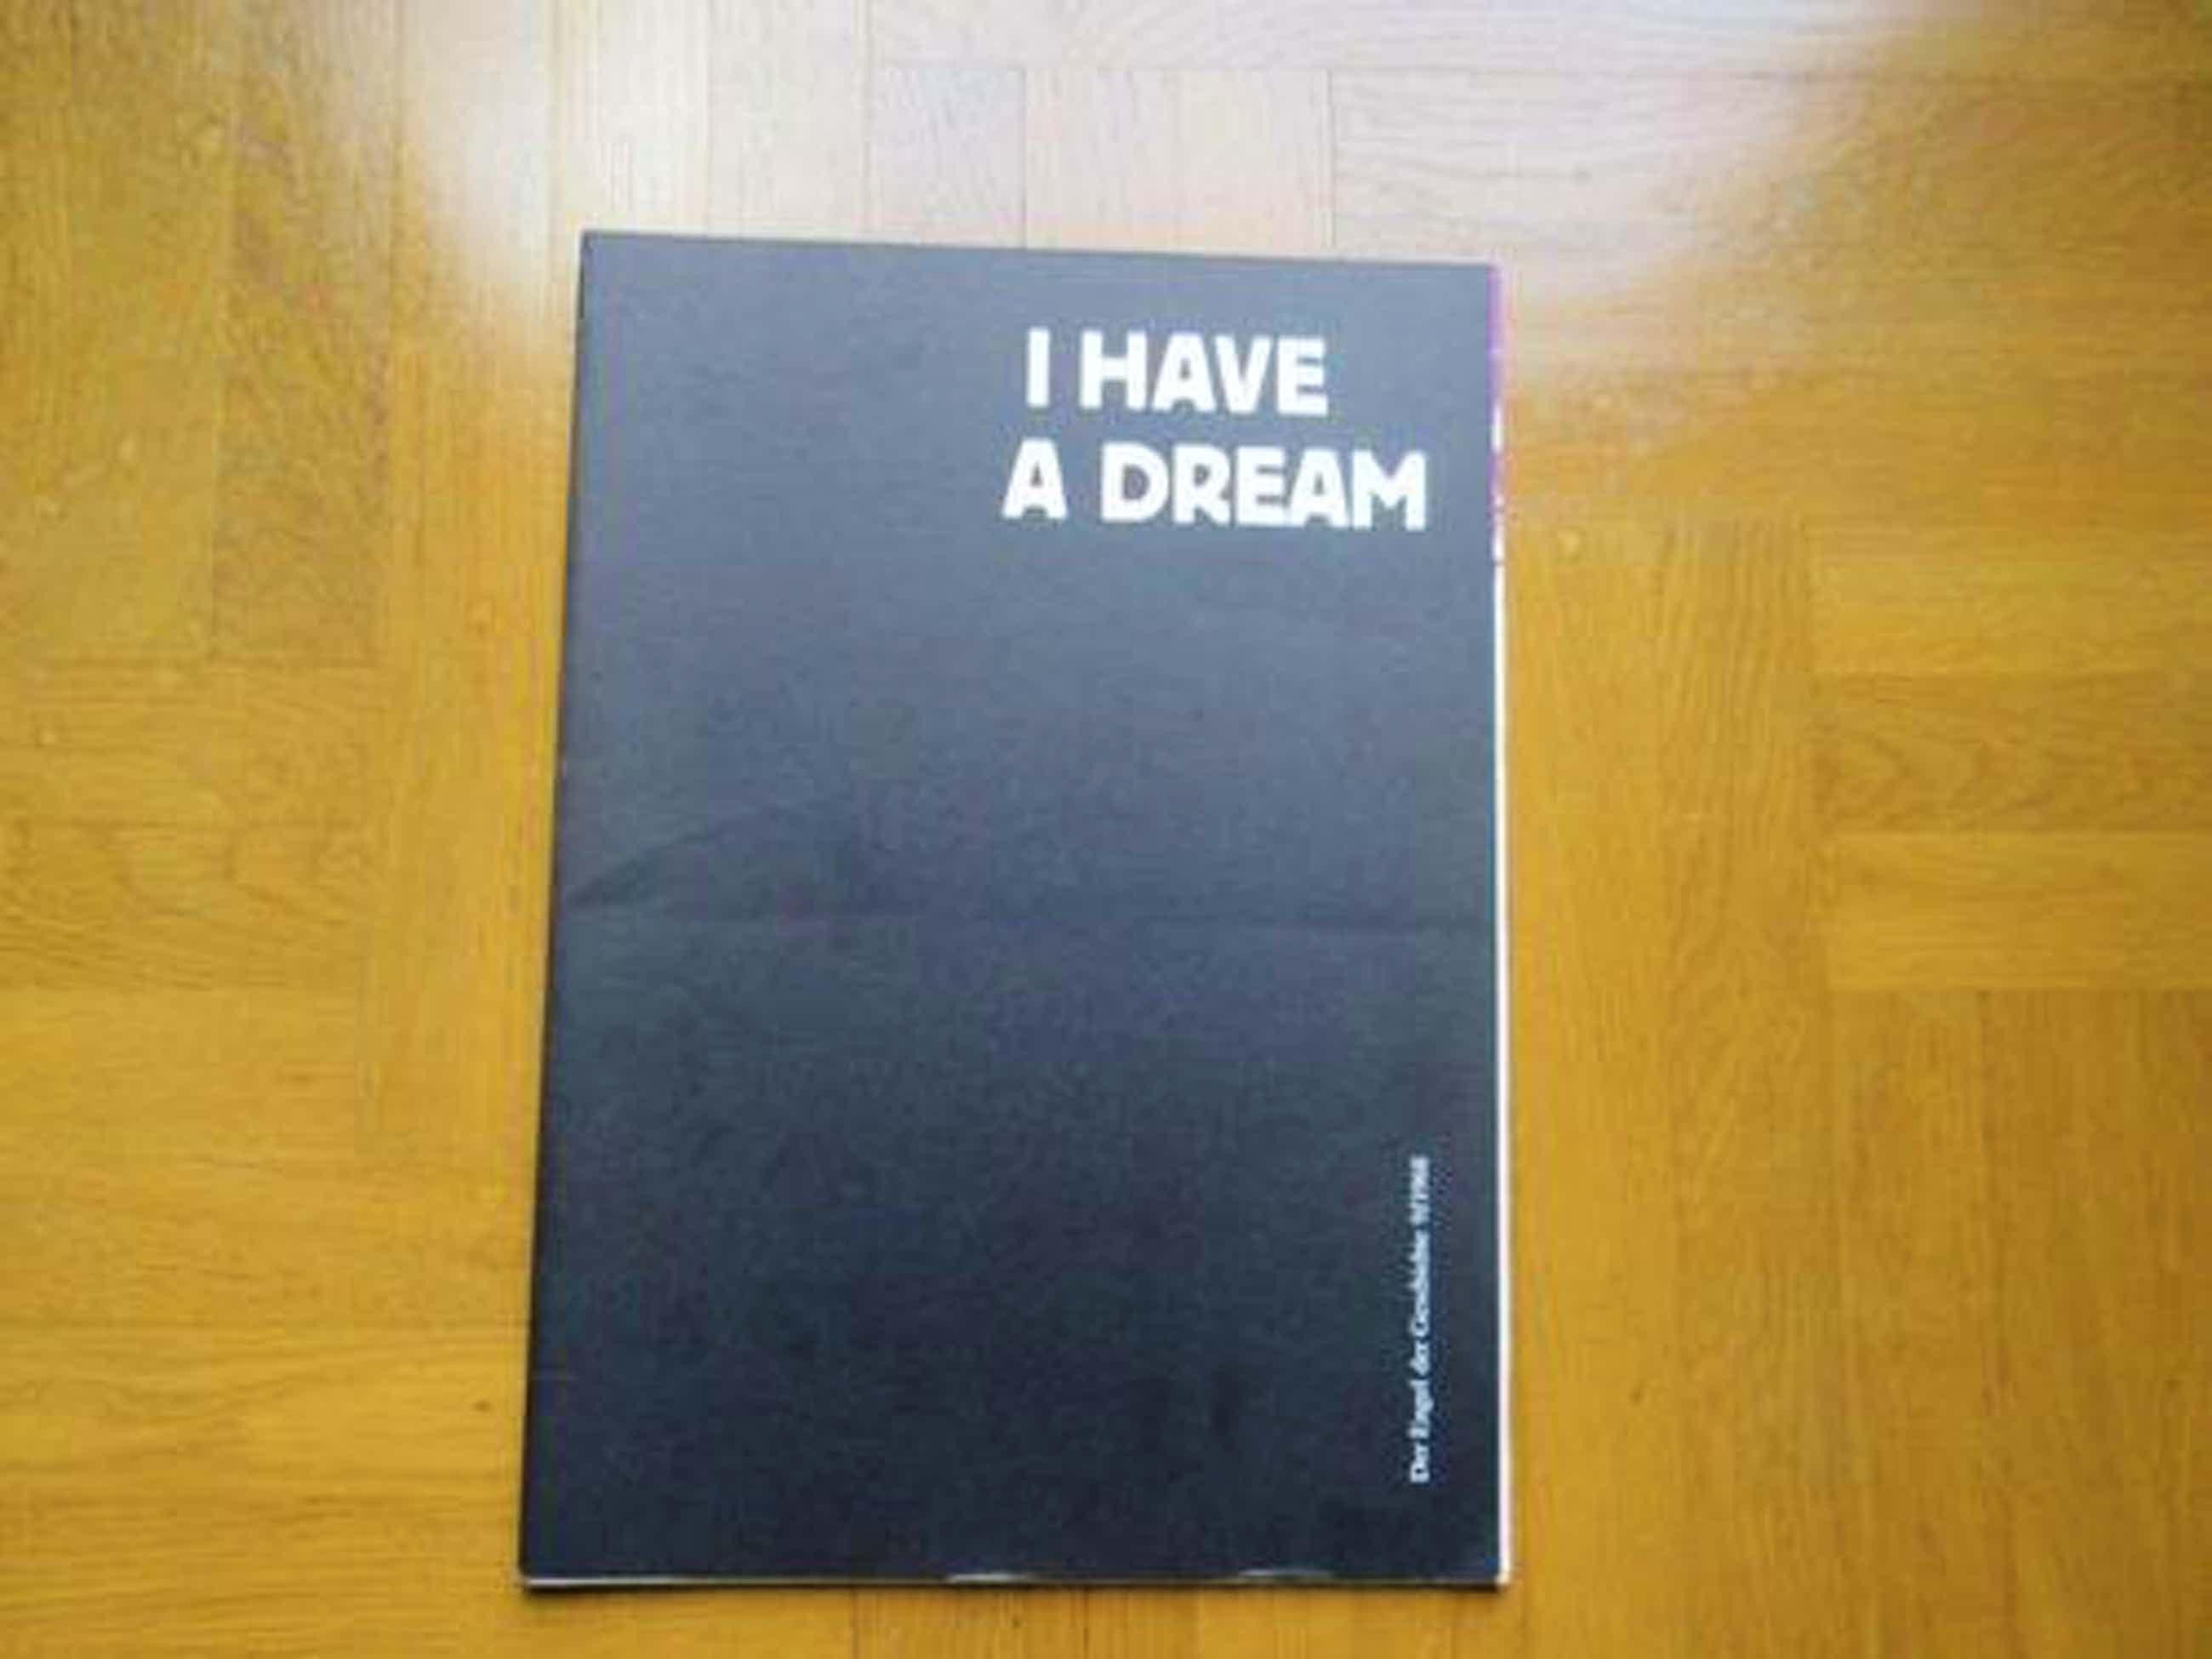 Helmut Andreas Paul Grieshaber - Grieshaber, HAP : Engel der Geschichte Nr. 9/1968 I HAVE A DREAM kopen? Bied vanaf 60!